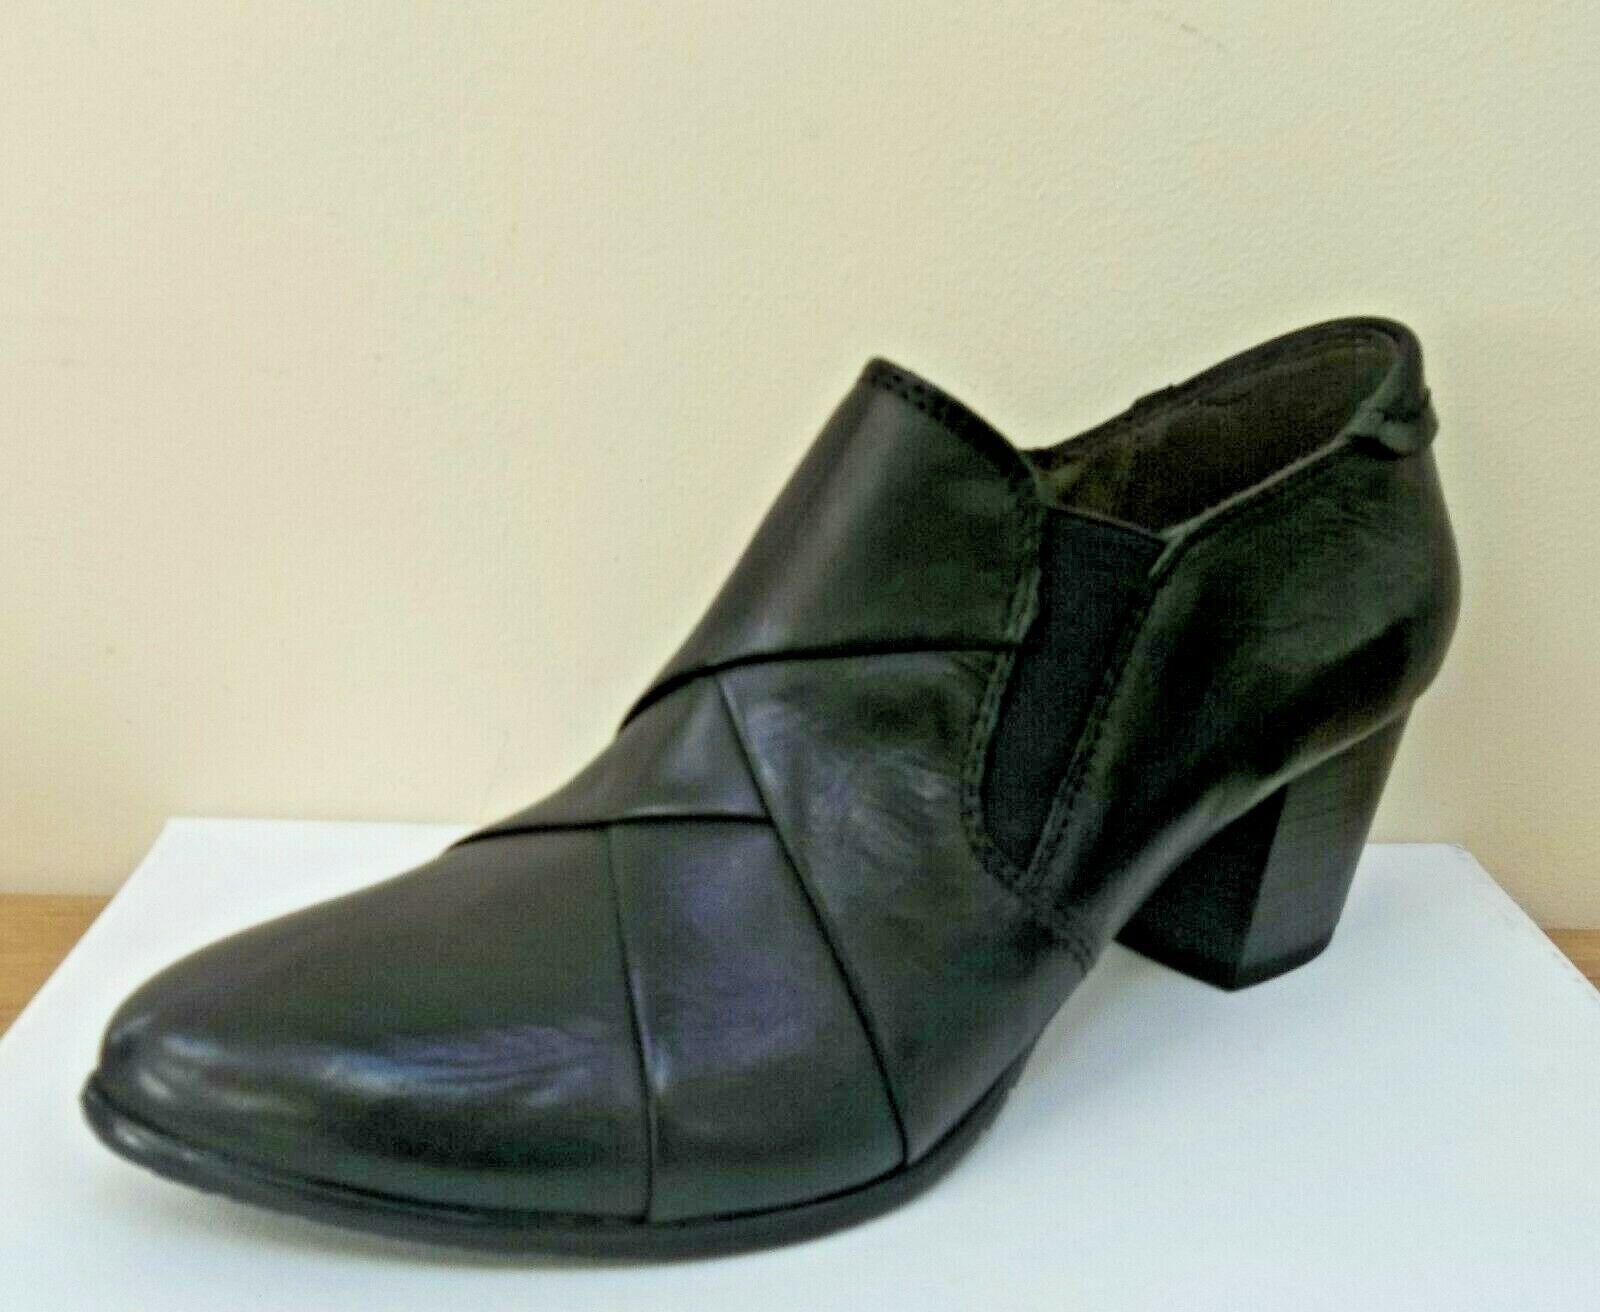 Caprice noir leather chaussures bottes, UK 6 EU 39,   BNWB